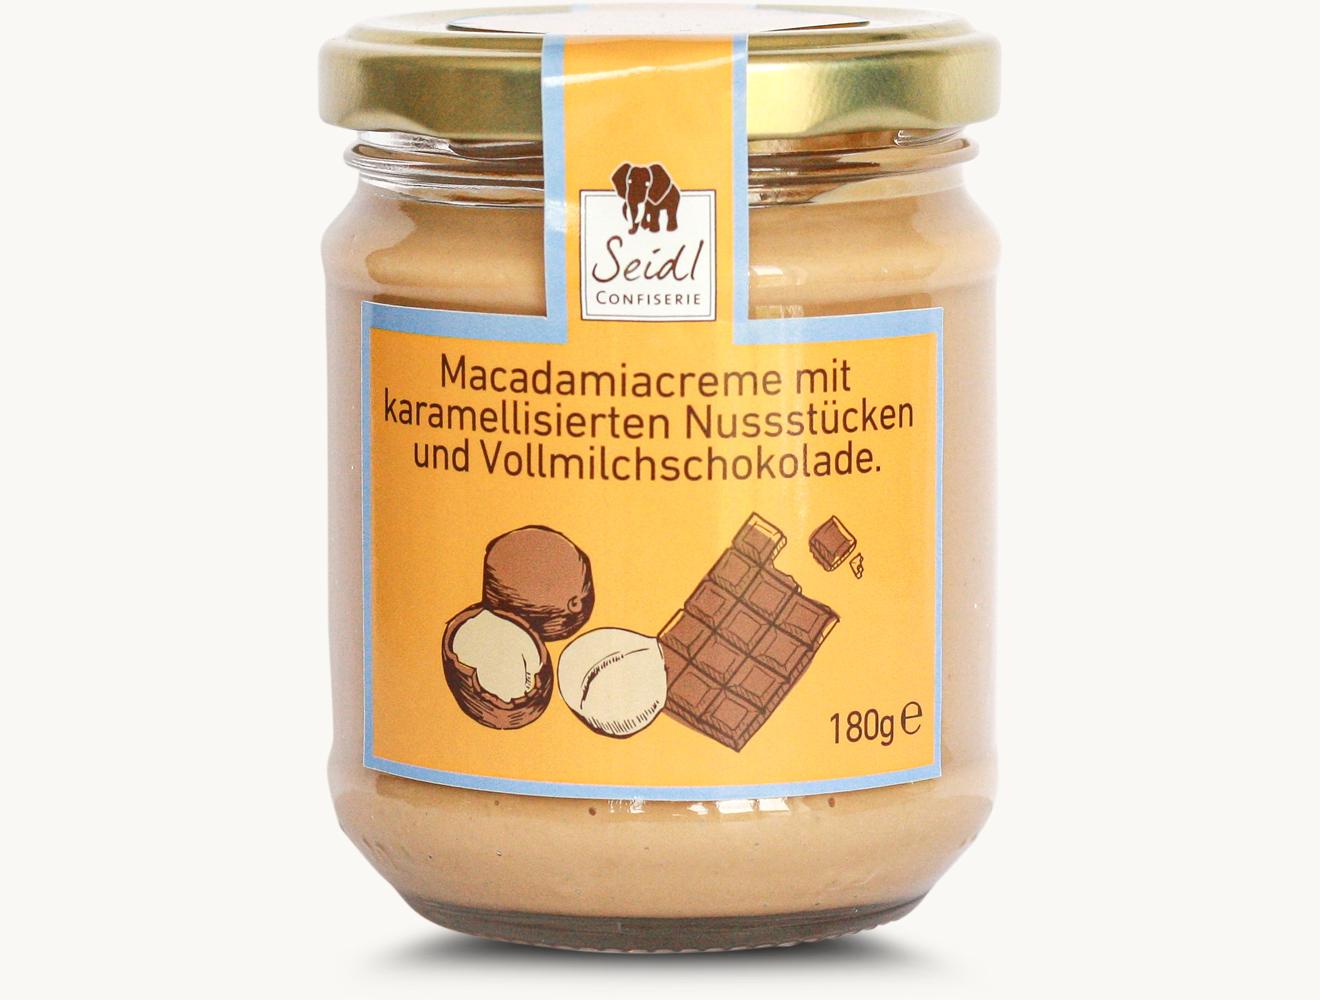 Macadamia Brotaufstrich Schoko & Nuss